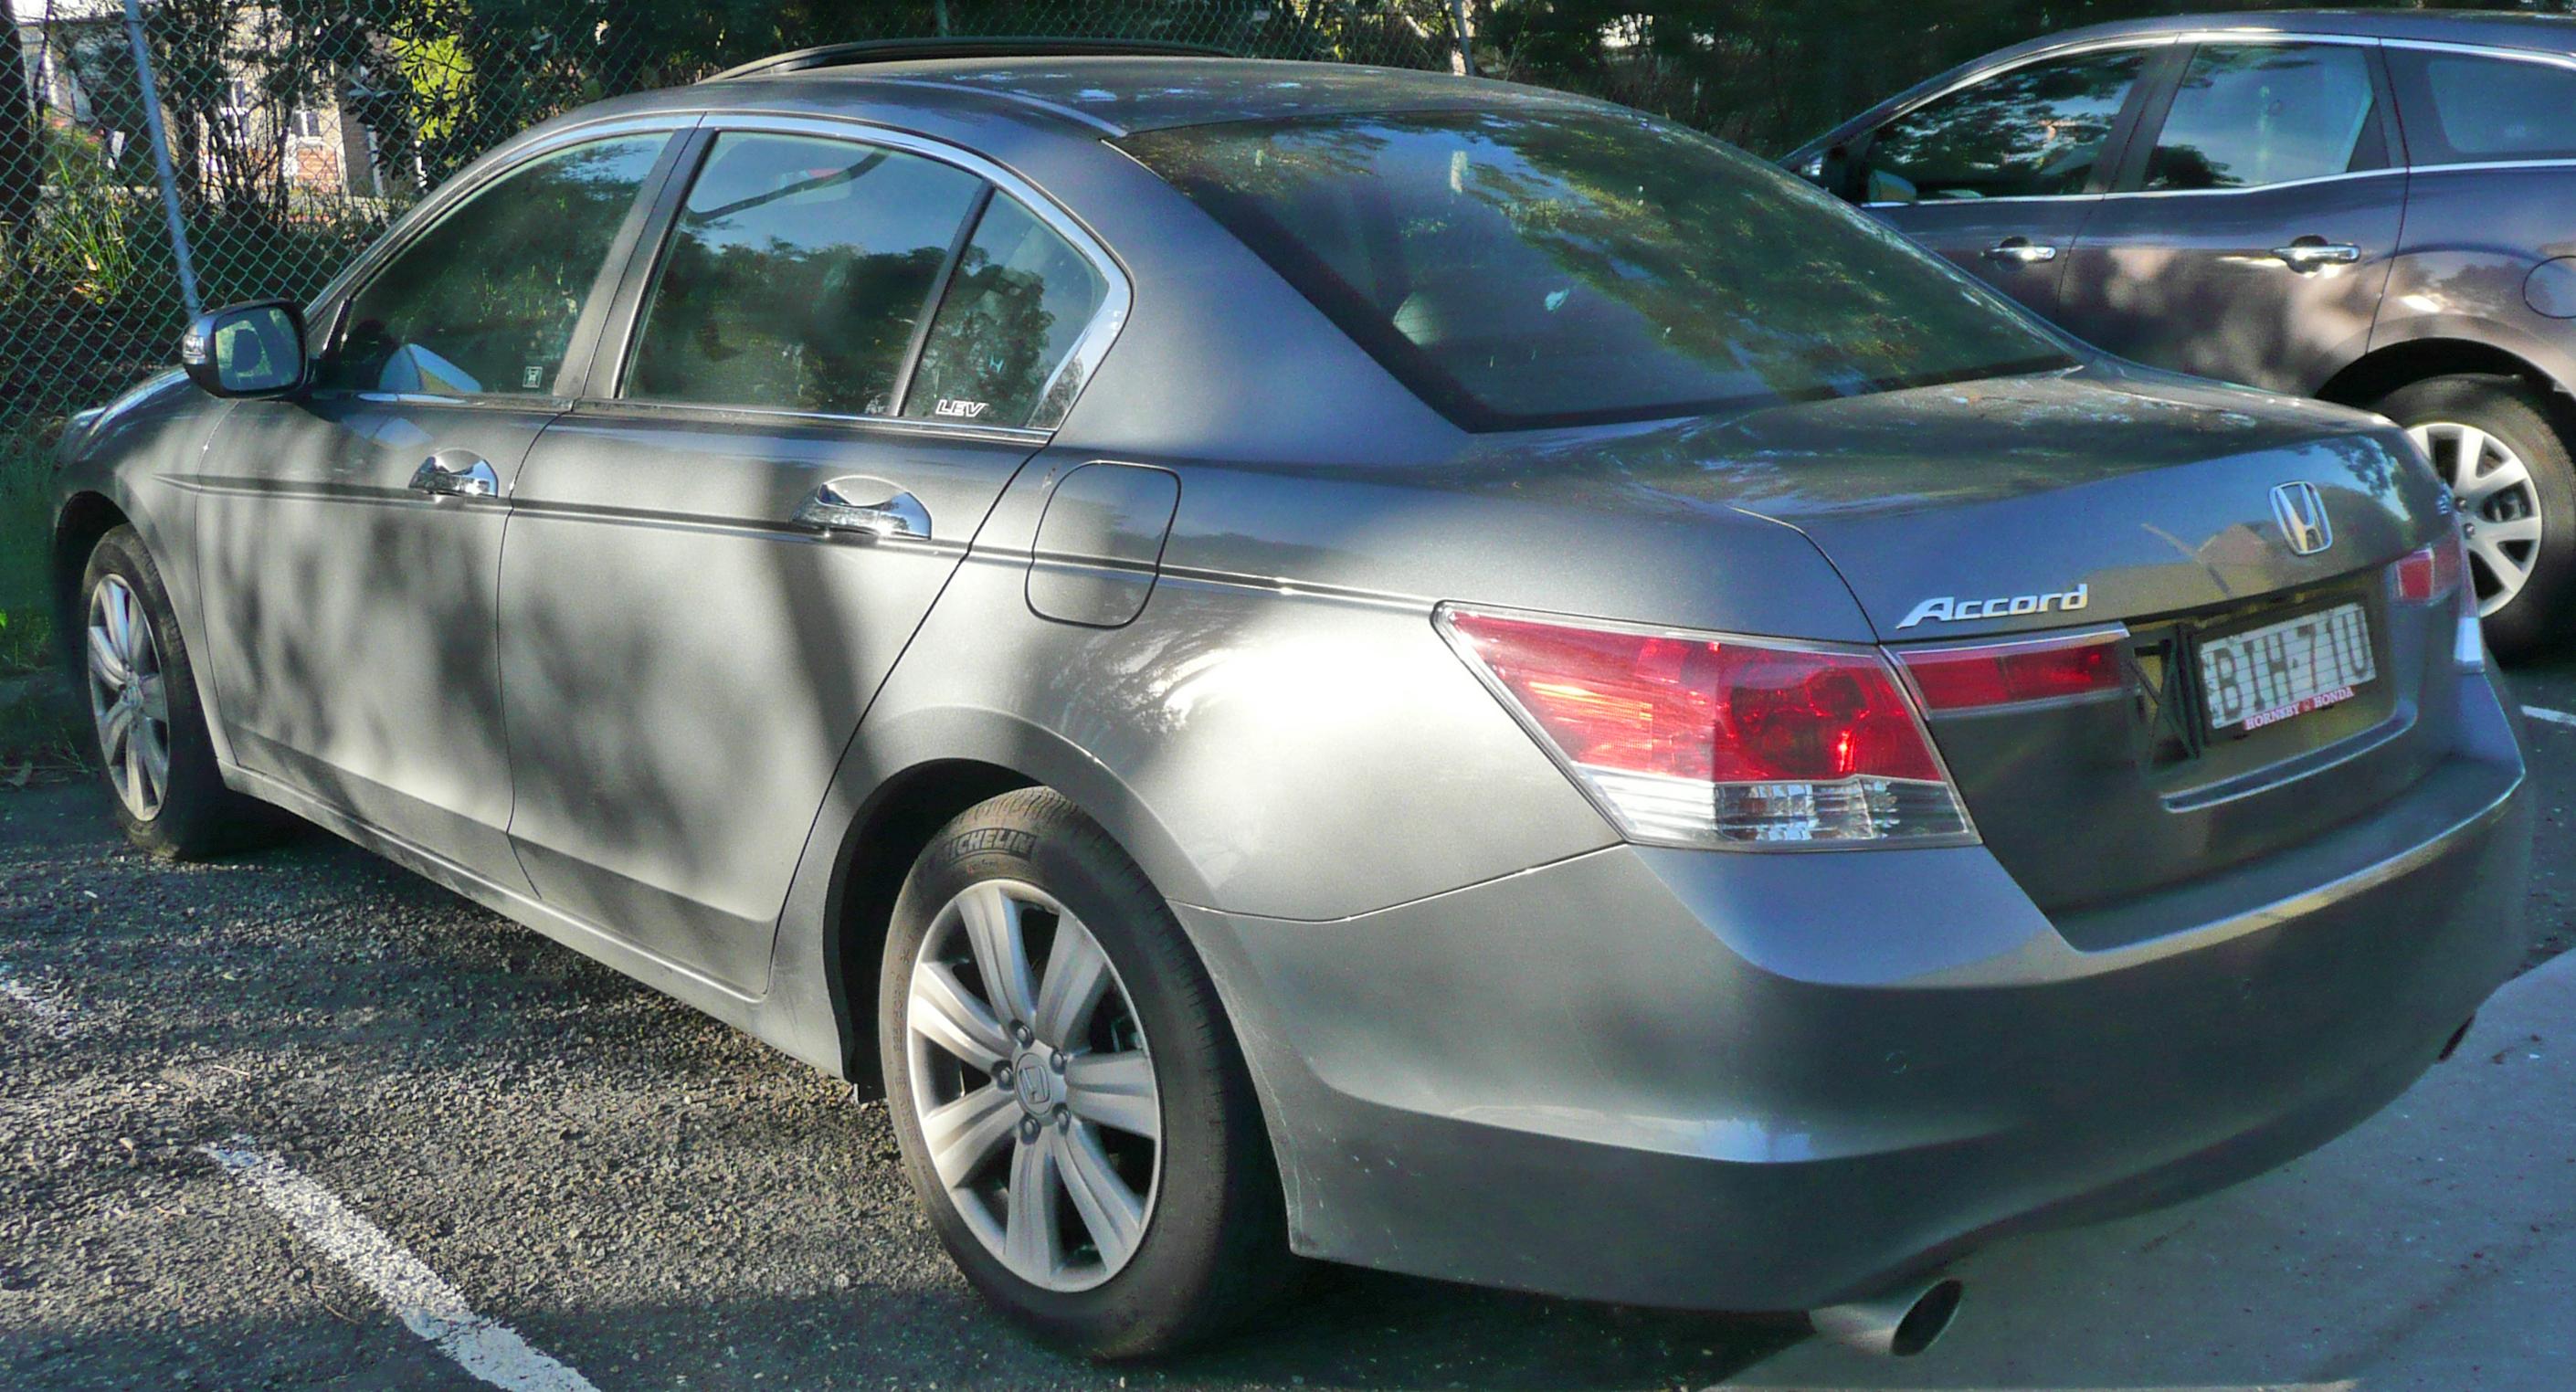 file 2008 2009 honda accord cp3 v6 luxury sedan 01     wikimedia commons